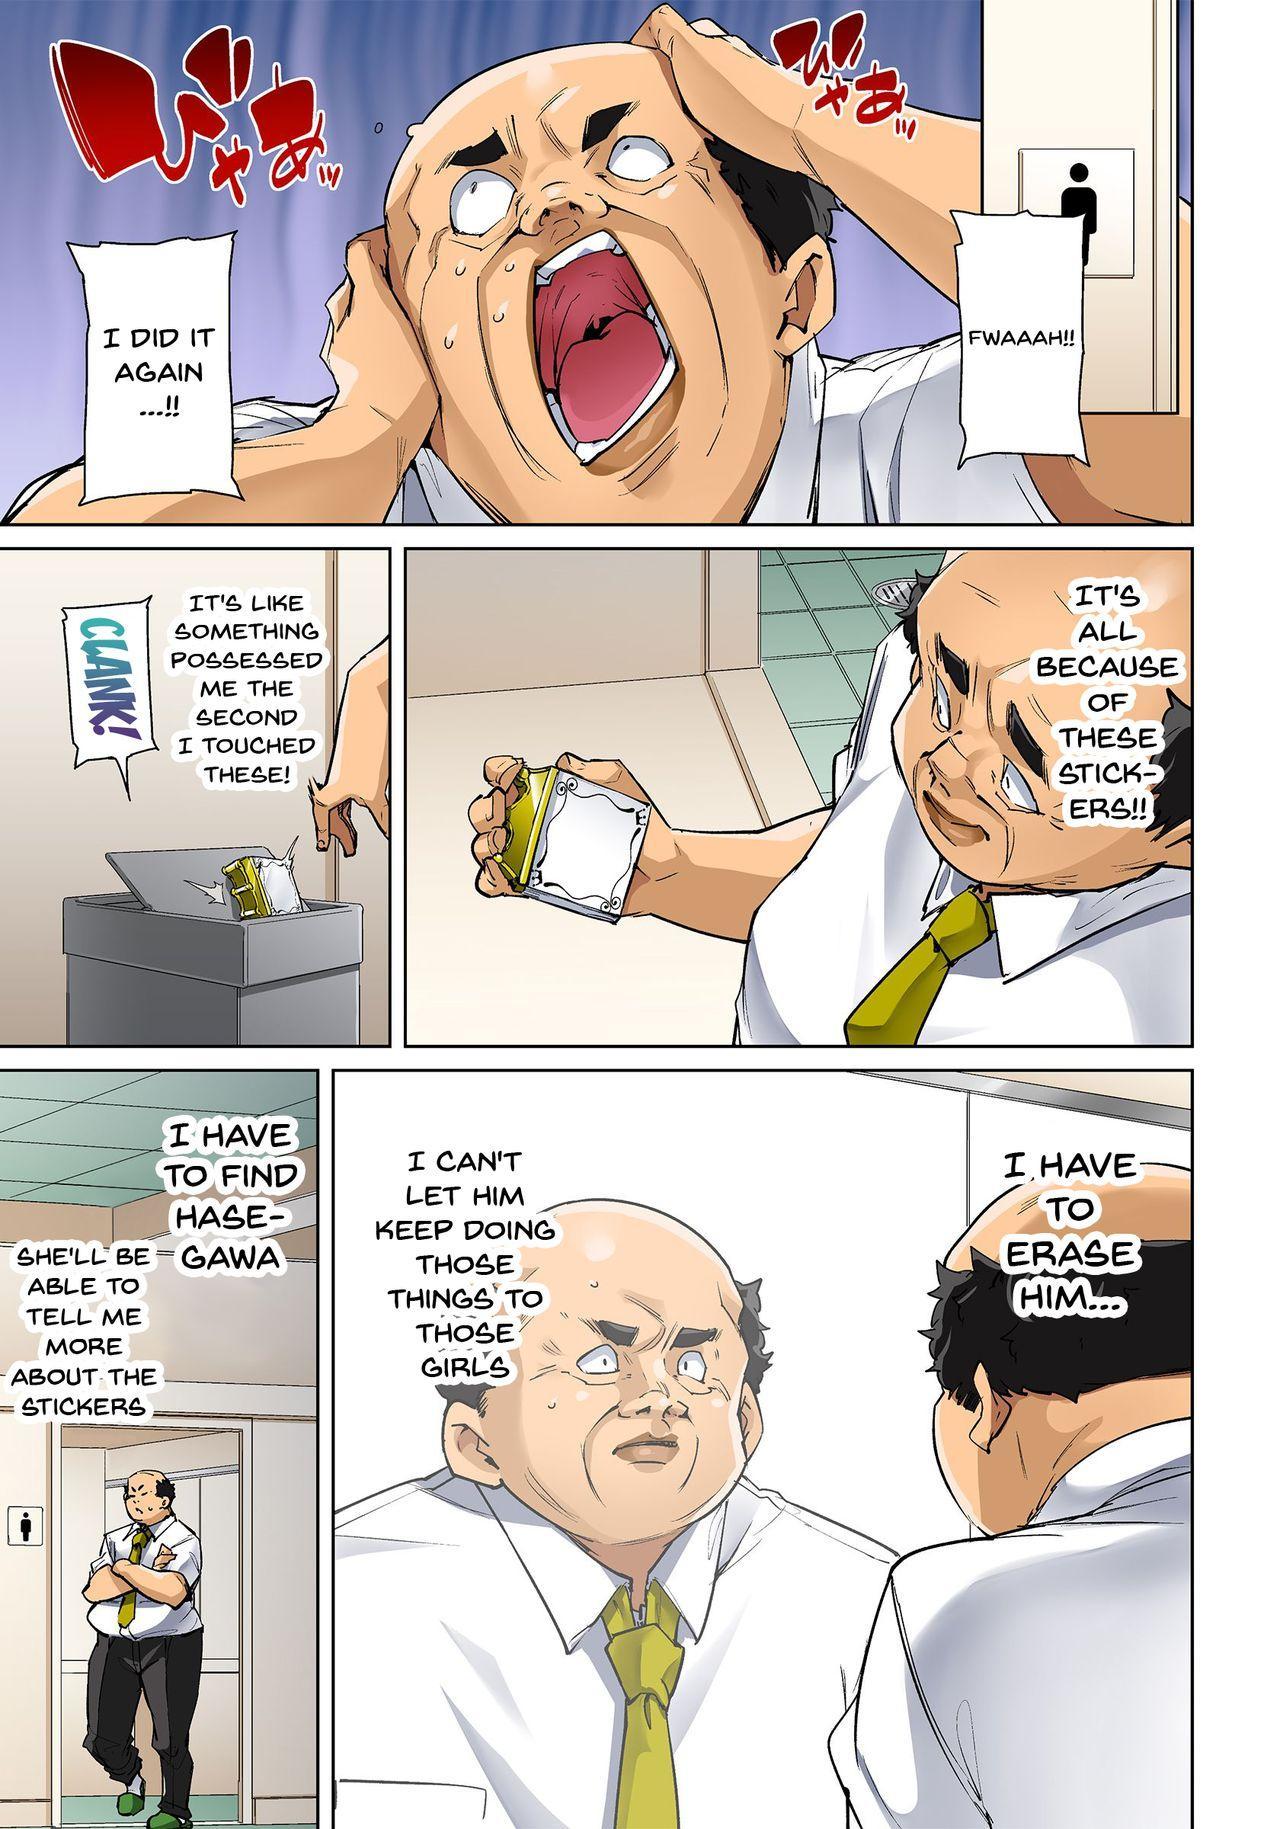 [Marui Maru] Hattara Yarechau!? Ero Seal ~Wagamama JK no Asoko o Tatta 1-mai de Dorei ni~   Commanding Stickers!? Ero Seal ~With One Sheet Selfish High Schoolers Become Enslaved to Cock 1-19 [English] [Doujins.com] [Digital] 416